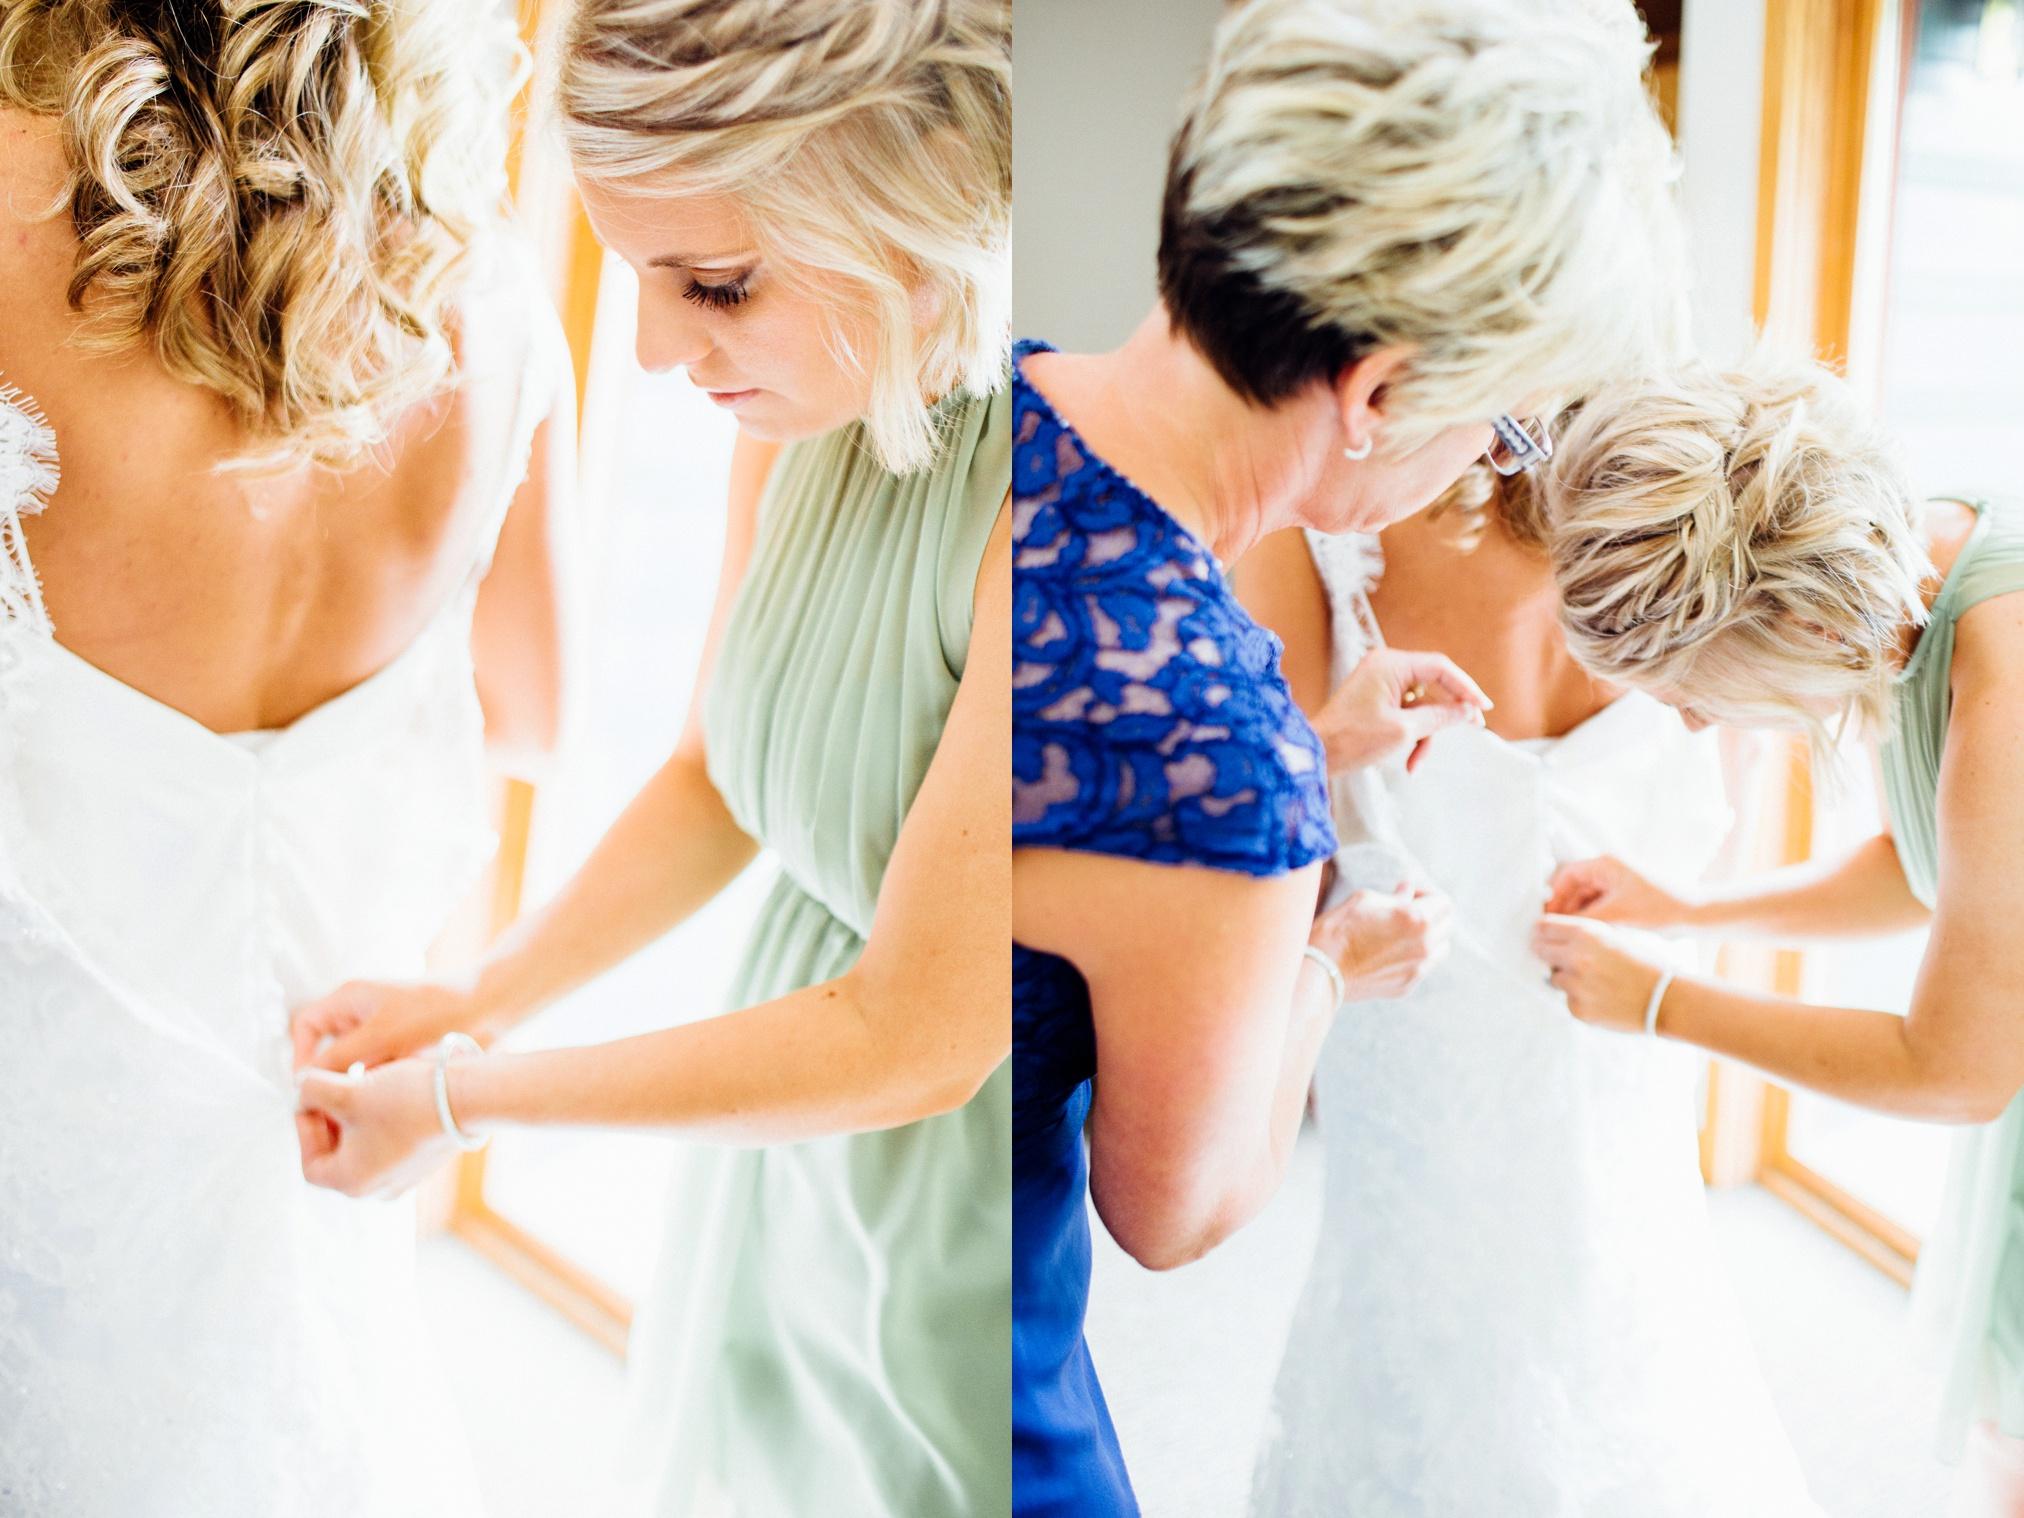 schmid_wedding-58.jpg